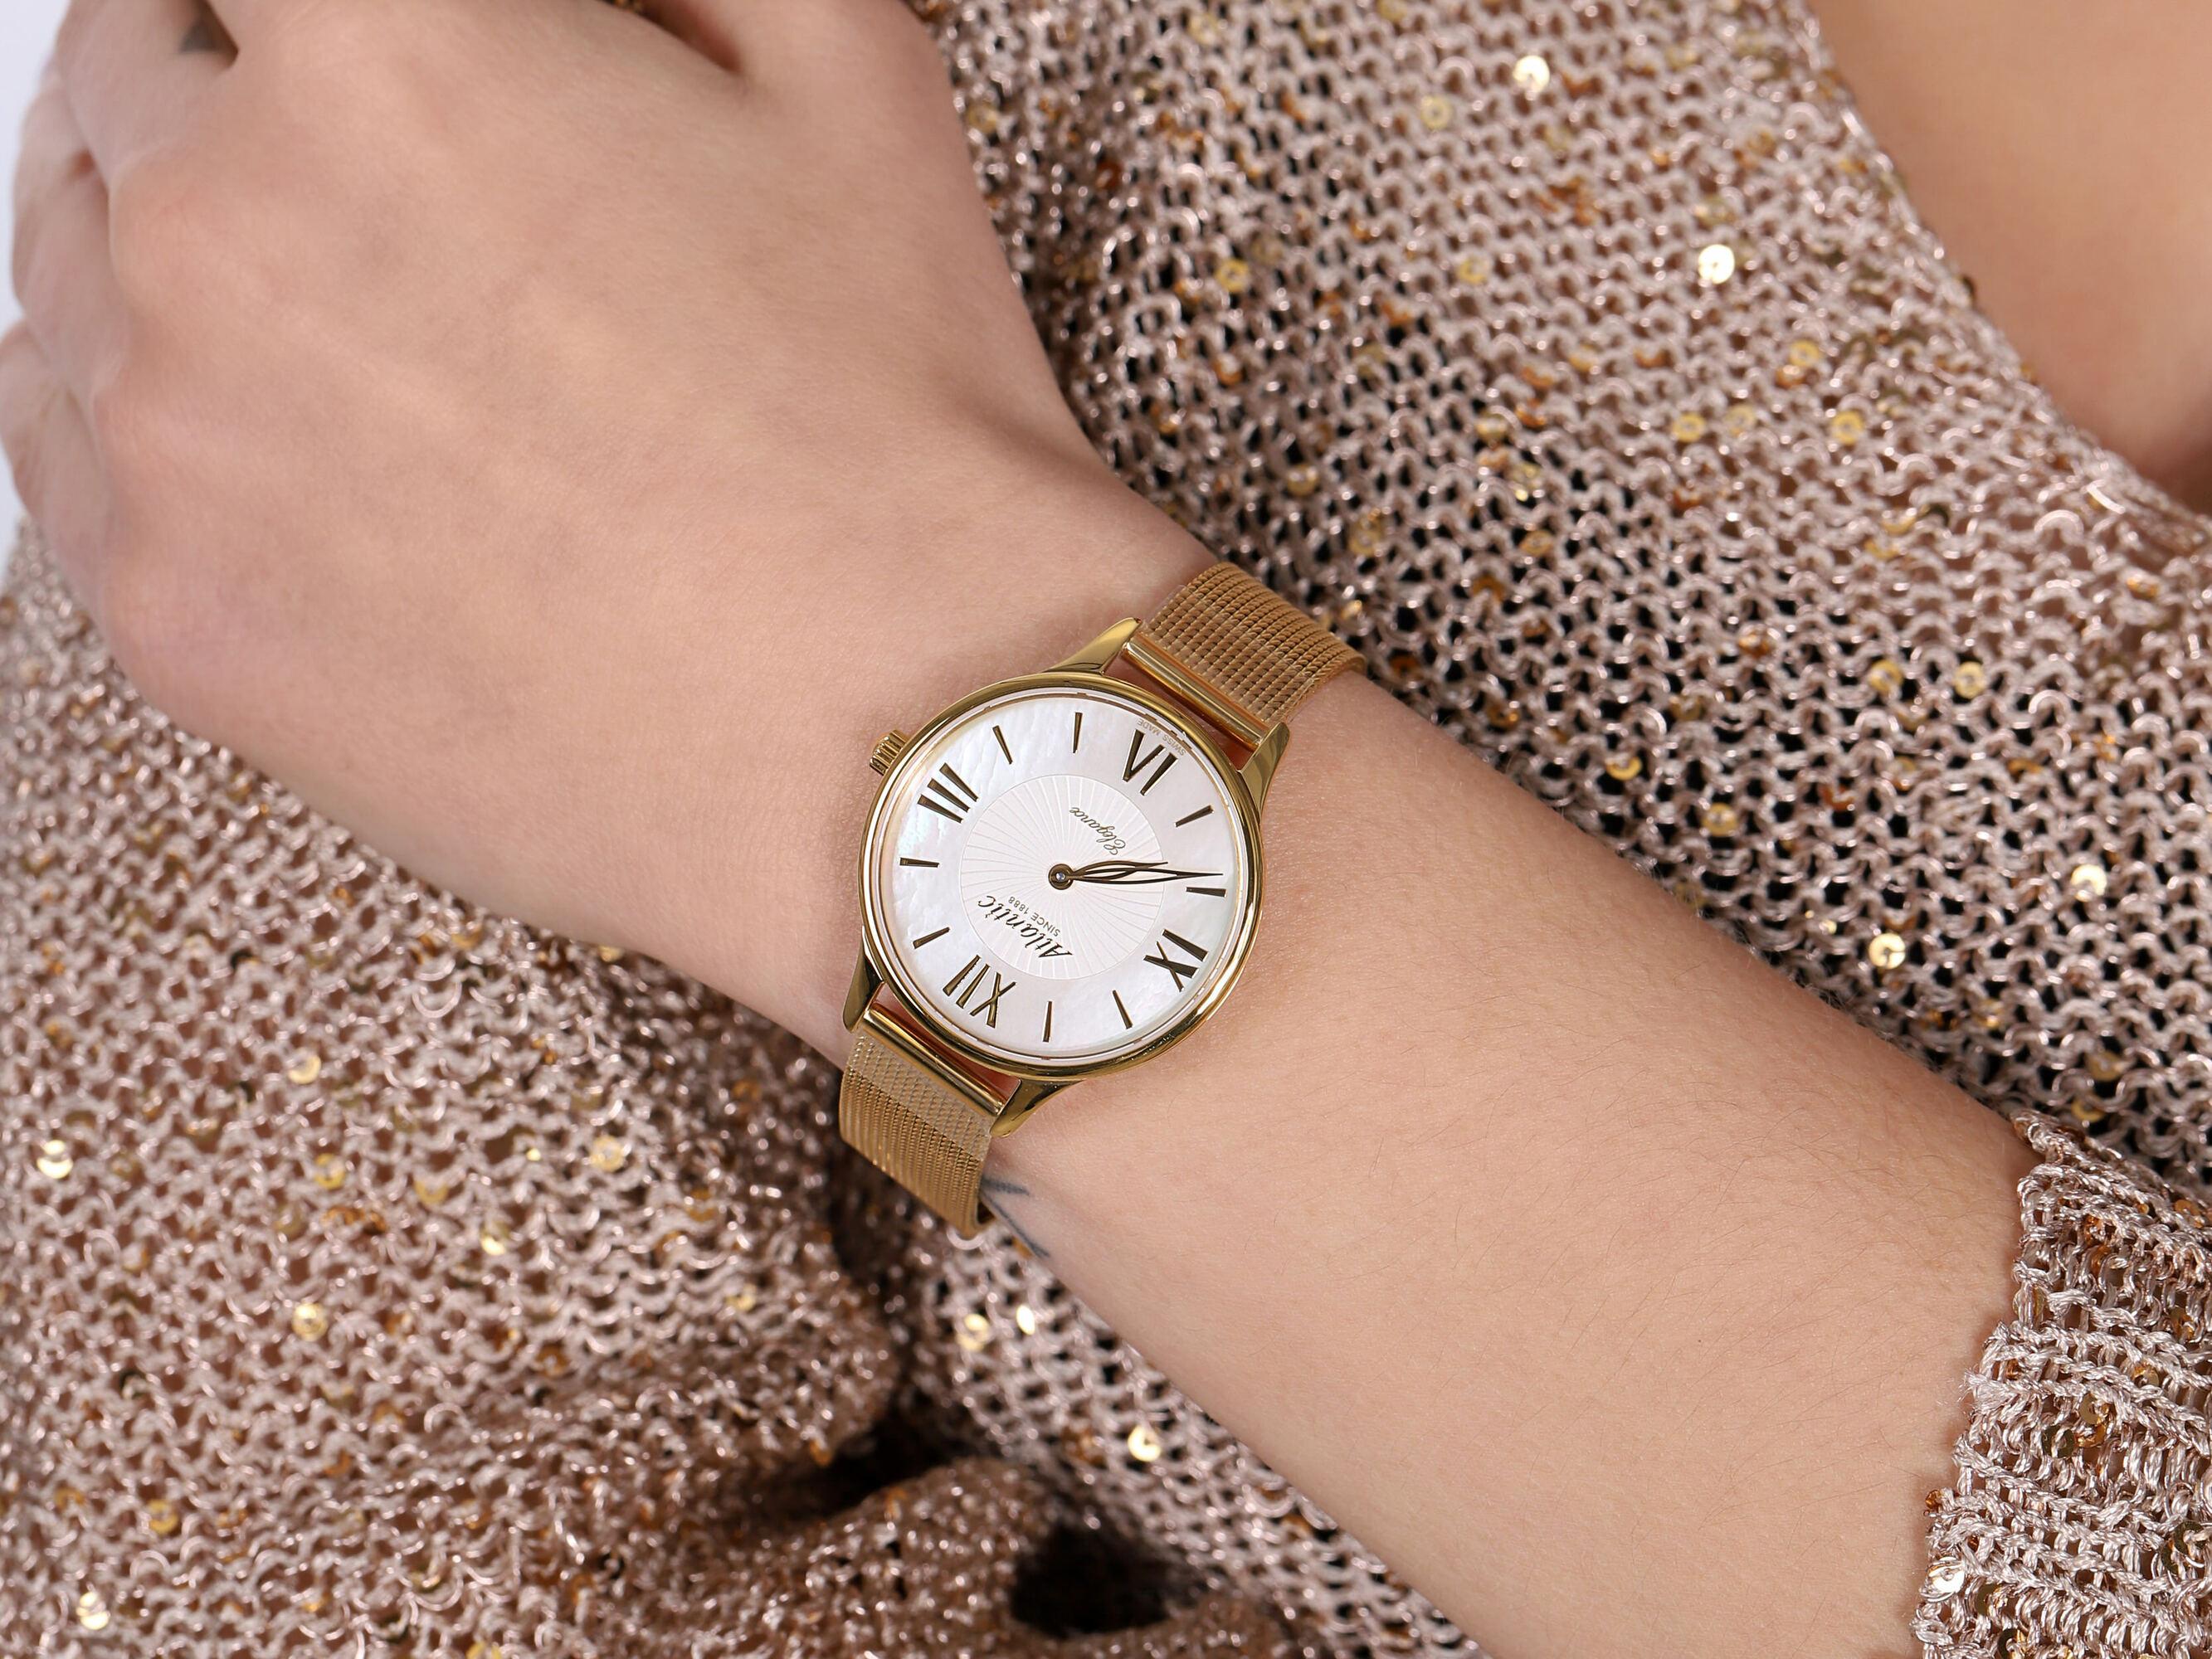 Atlantic 29038.45.08MB zegarek złoty klasyczny Elegance bransoleta